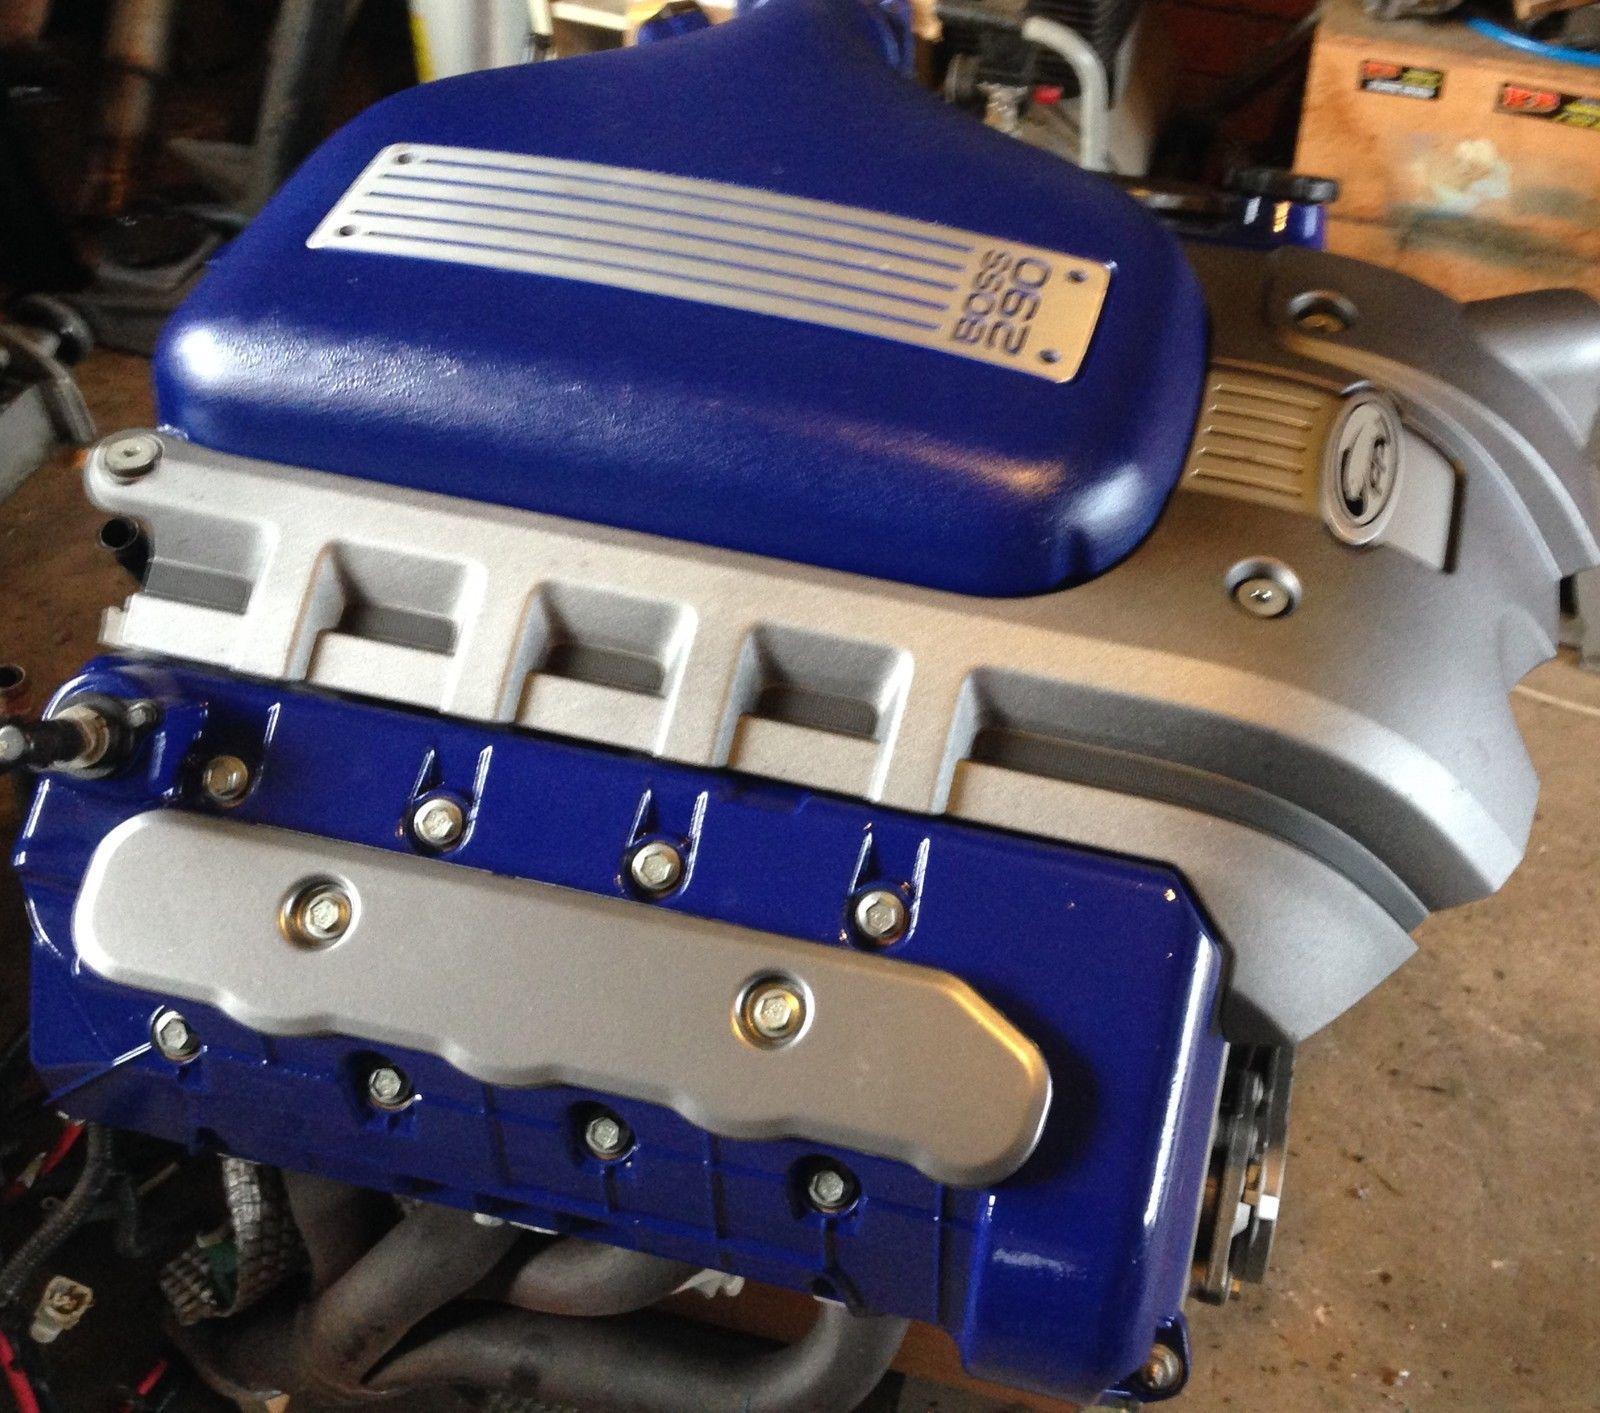 Ford boss 260 5 4l built motor forged manley pistons rods boss 260 fpv in